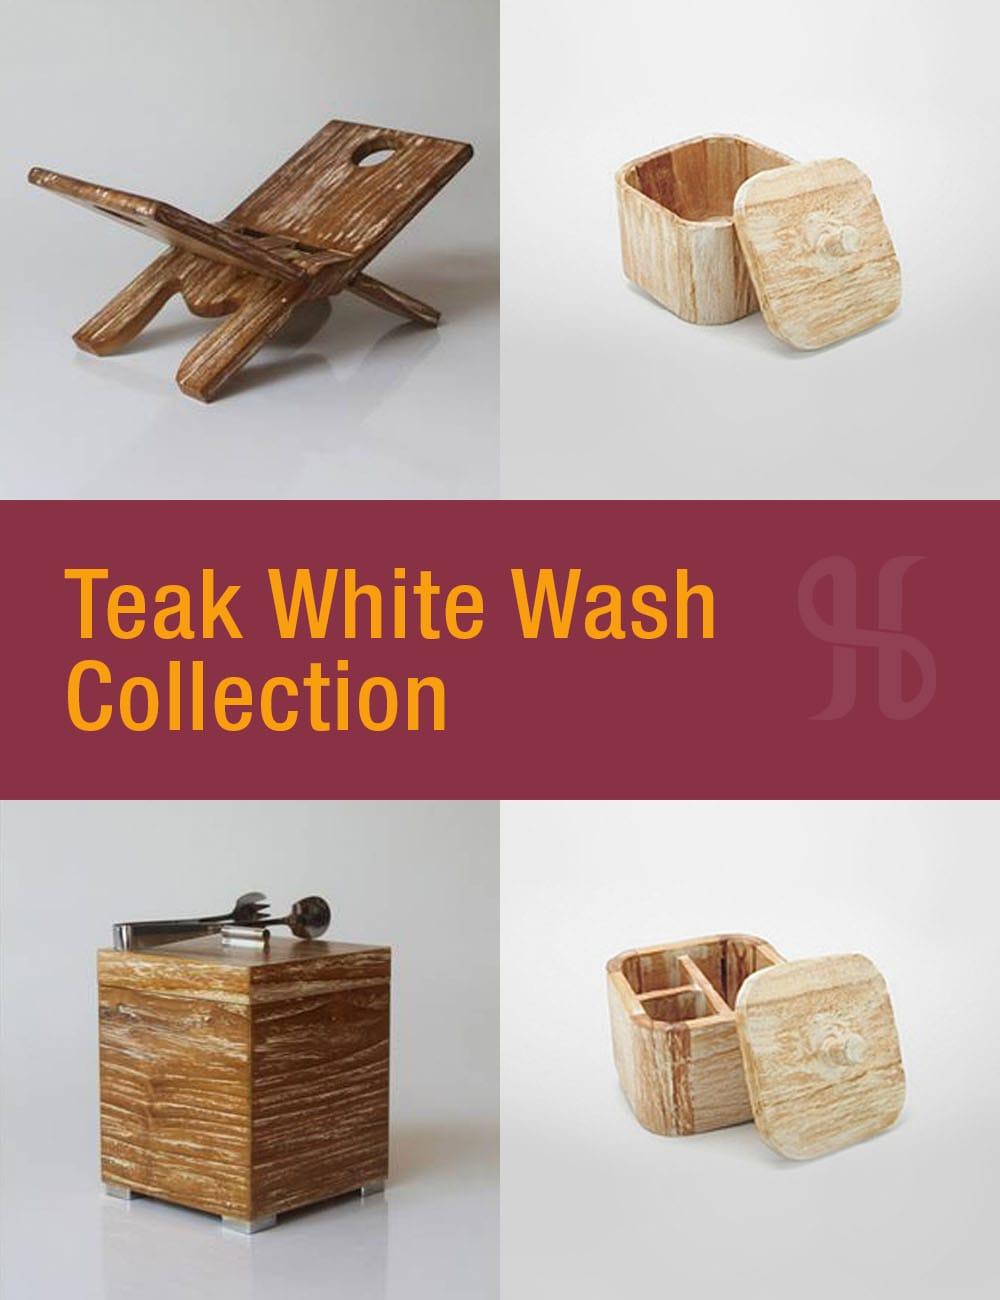 Teak White Wash Collection